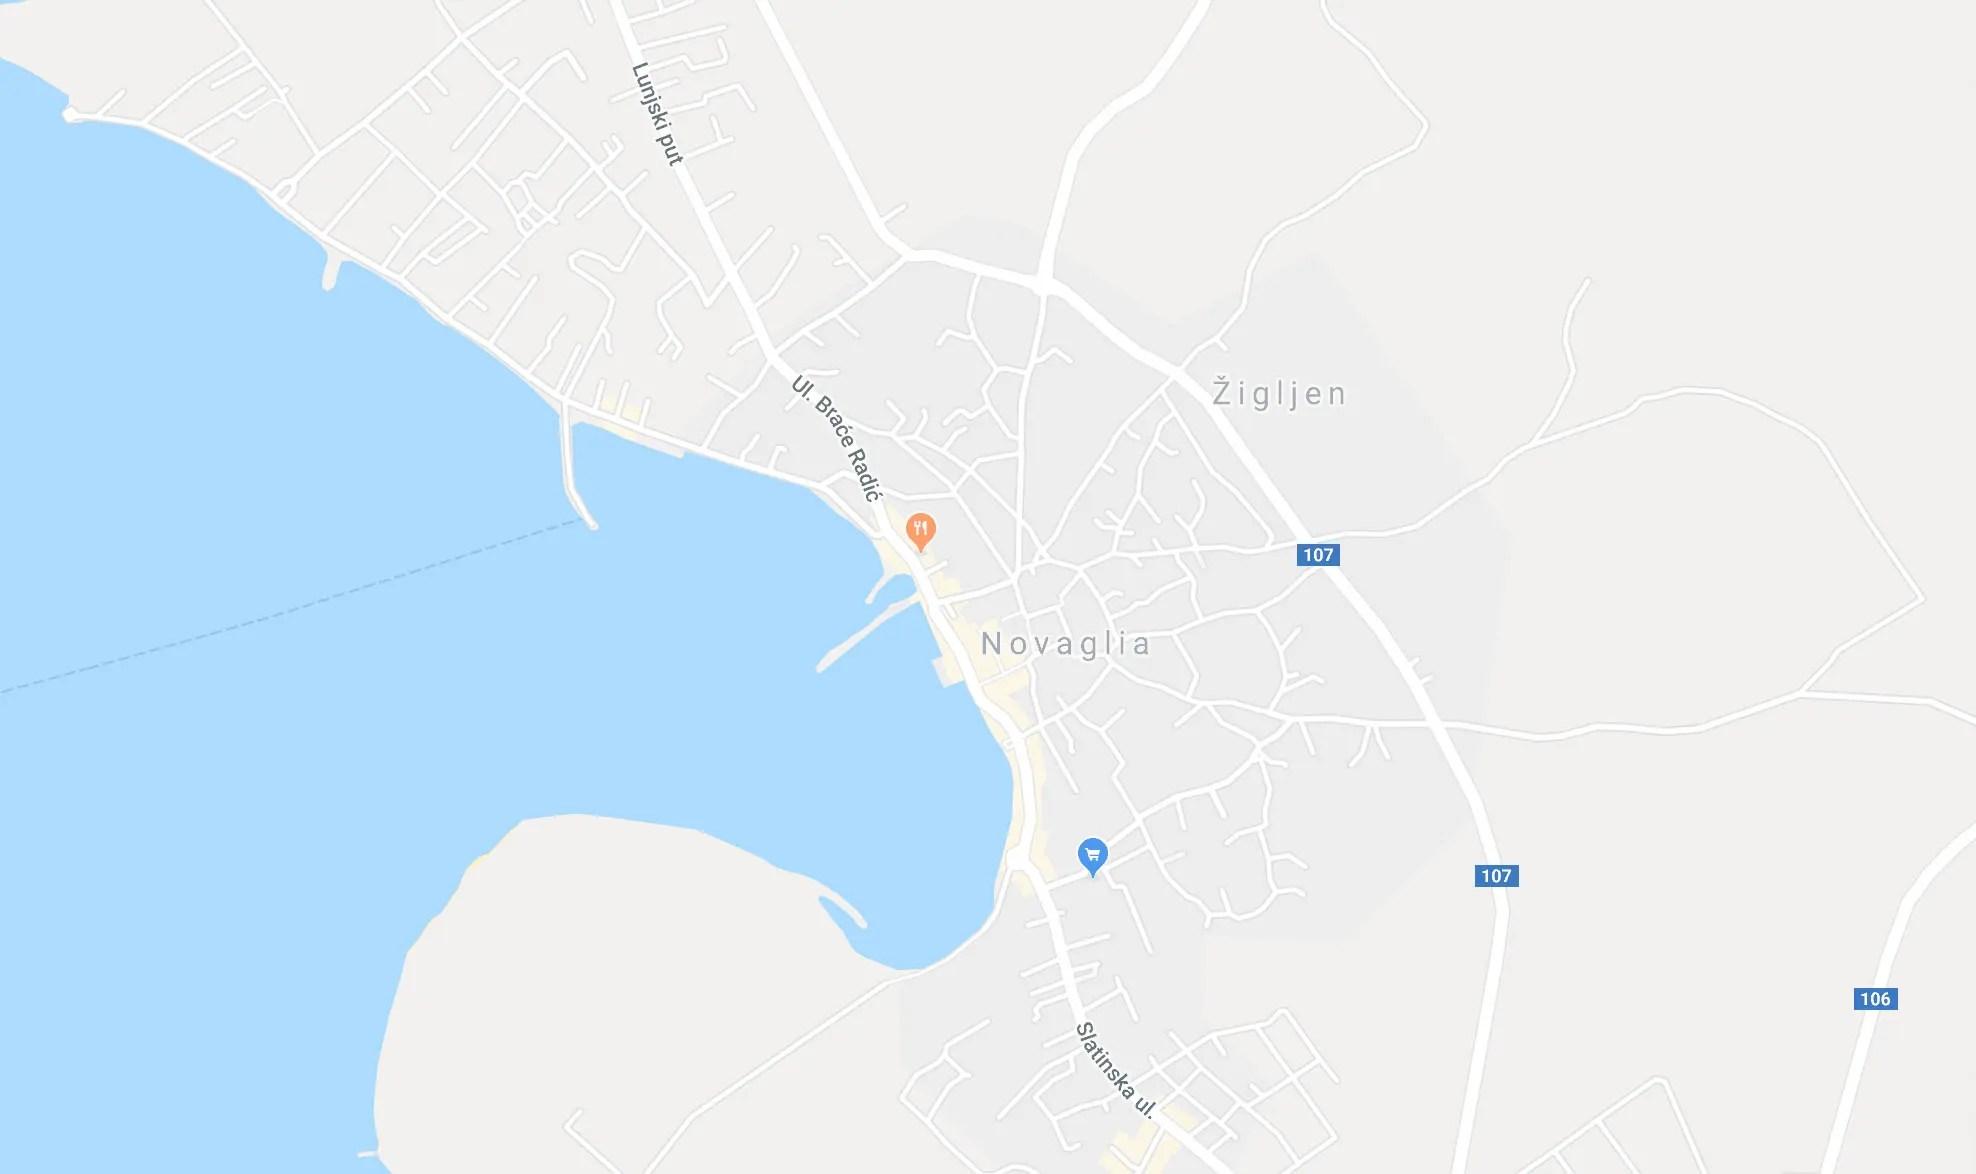 mappa città novalja pag